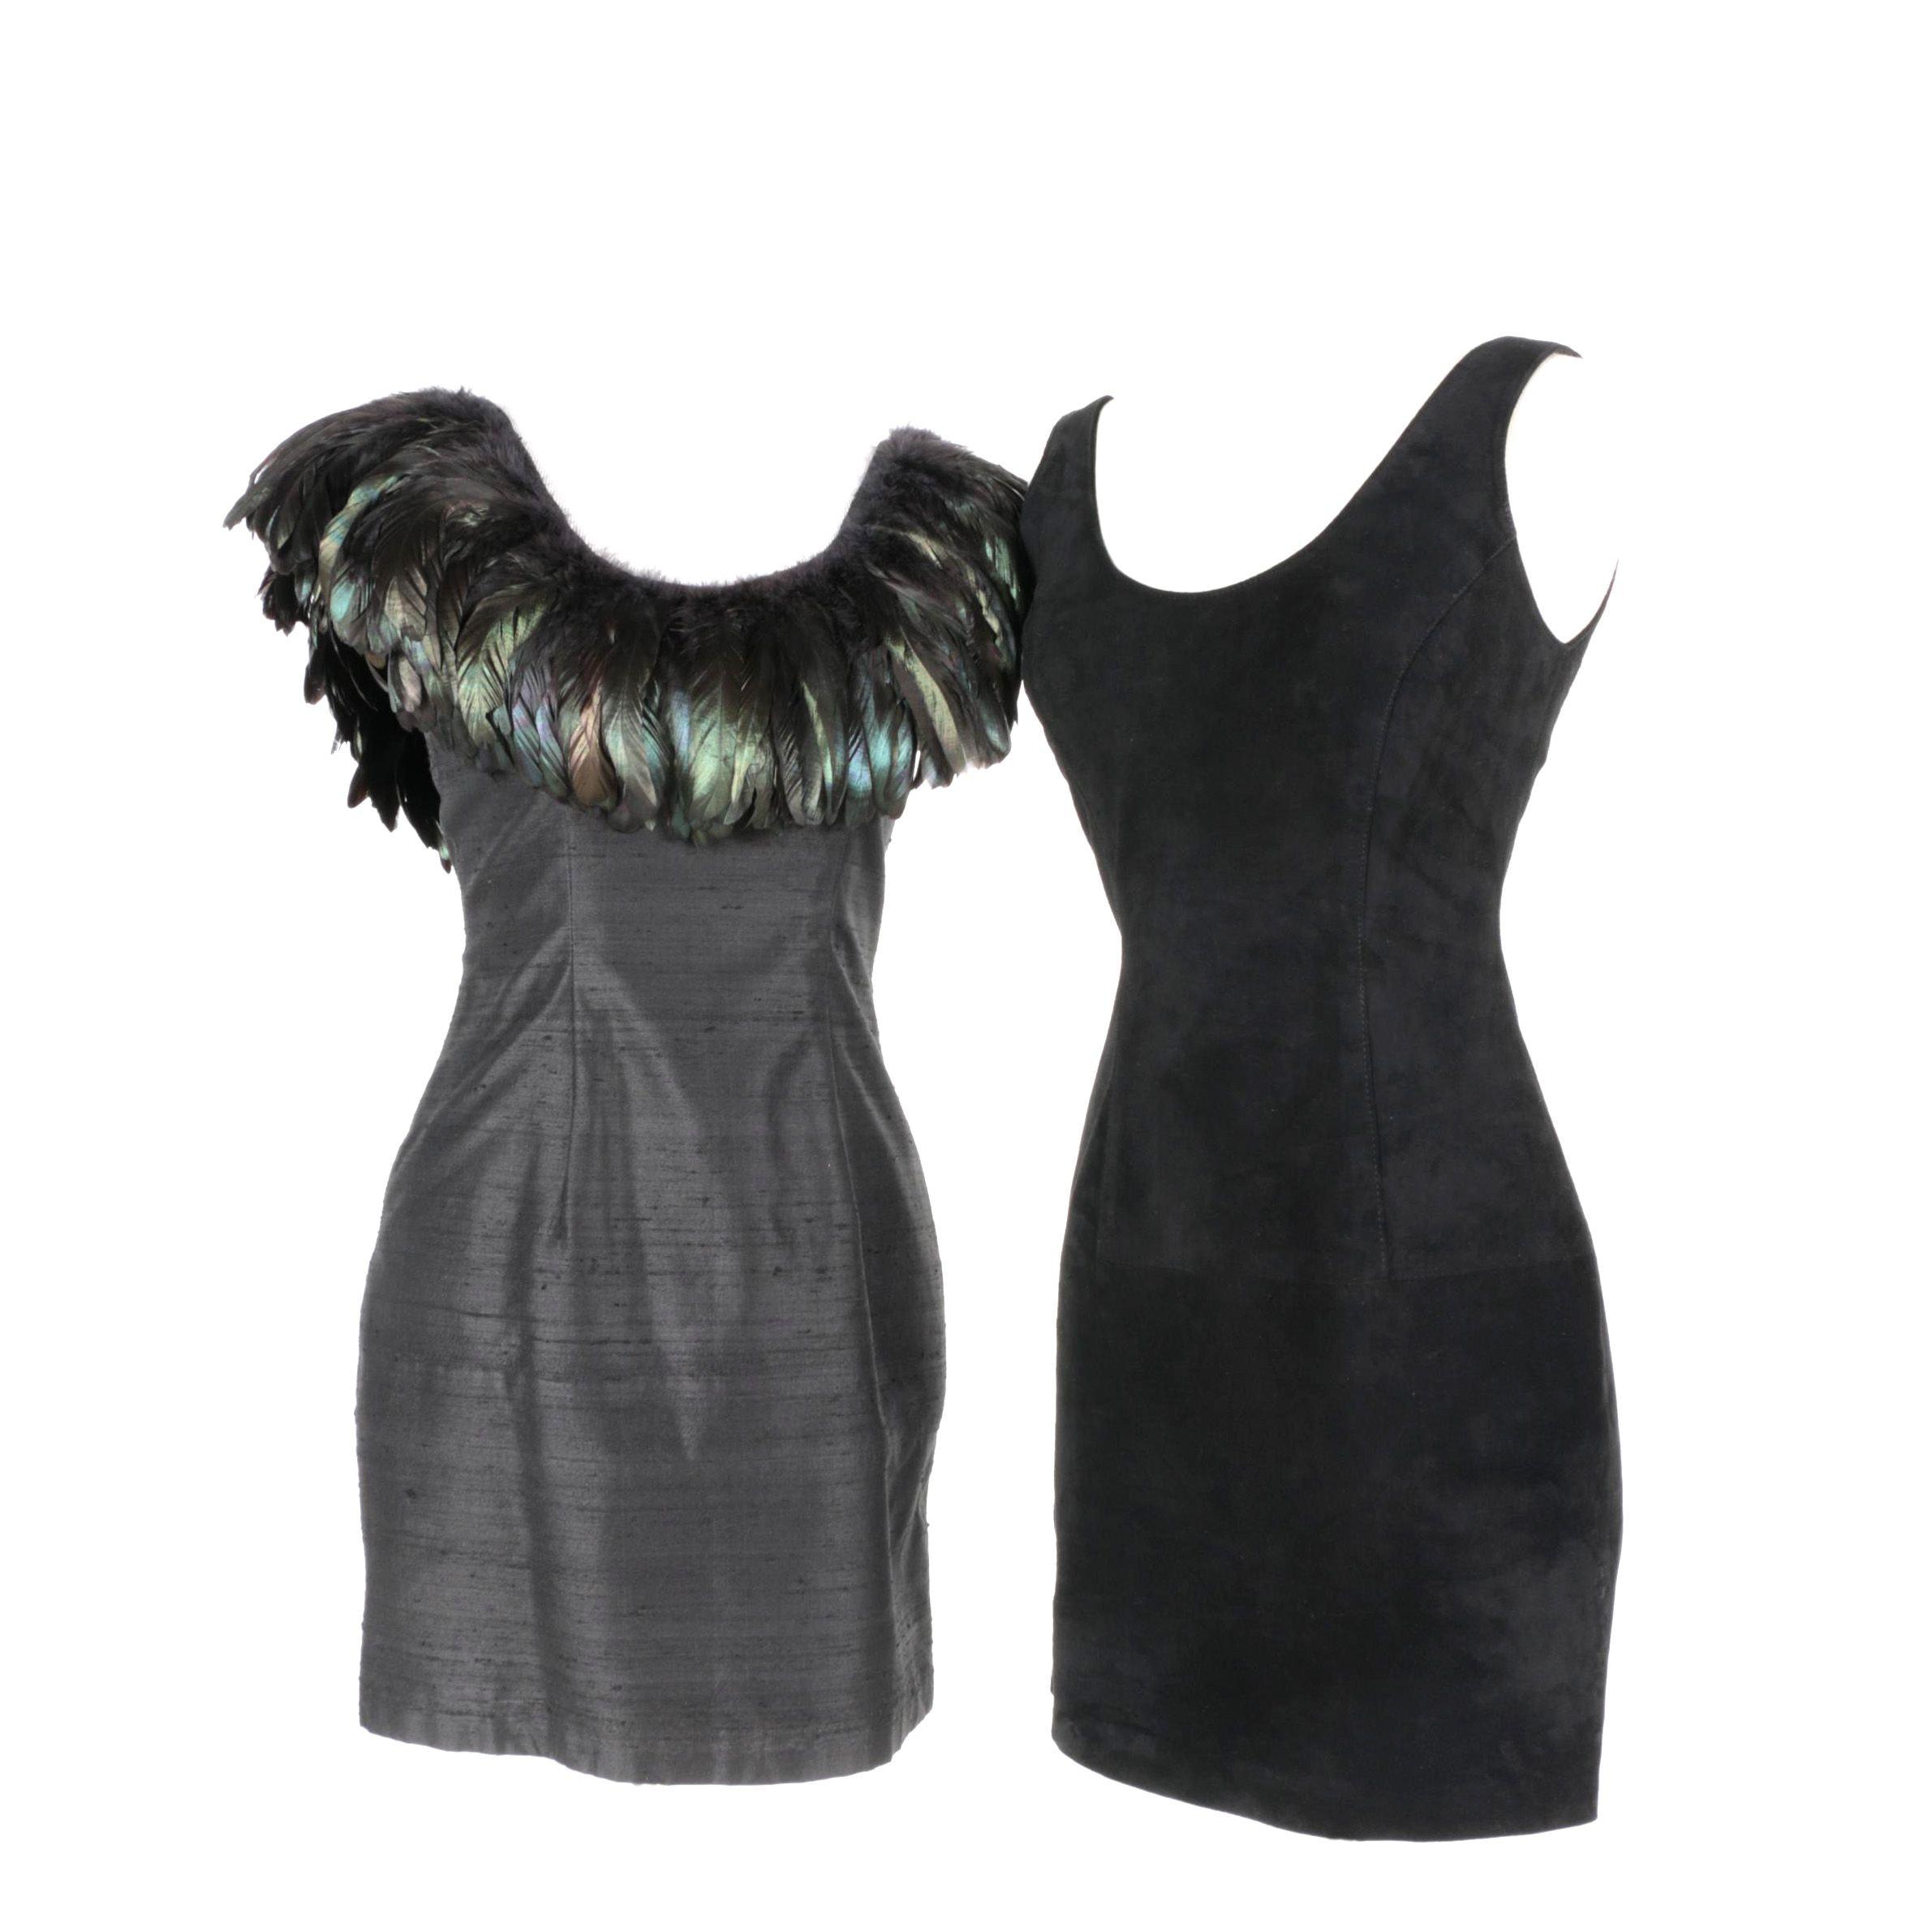 Women's Dresses Including Ann Taylor